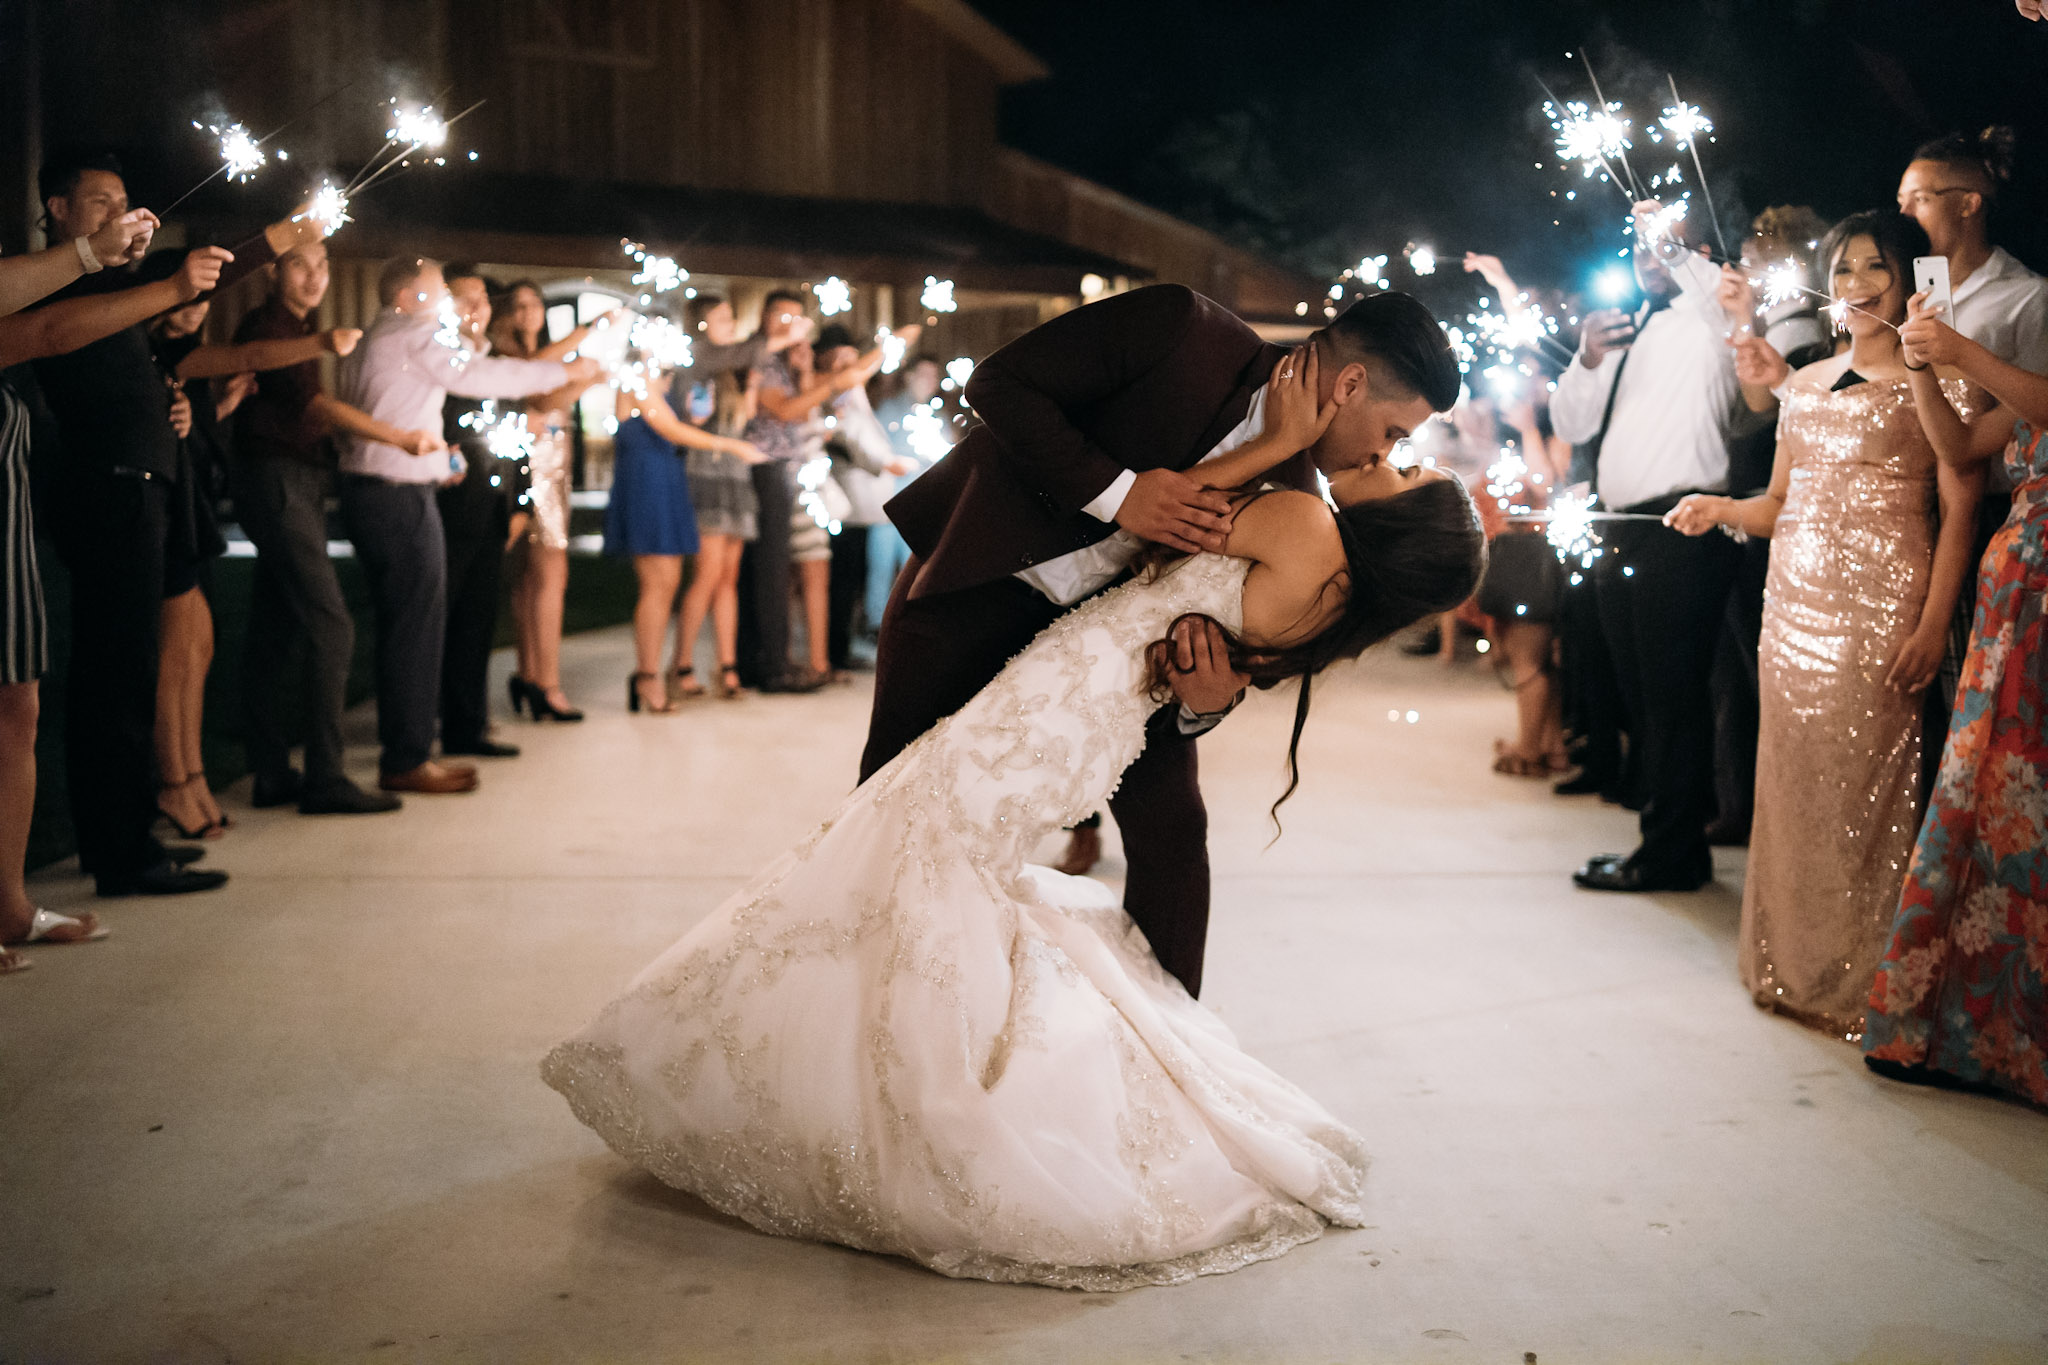 060718-A-JoeDel-Wedding-AdrianRGarcia-FOMAScine_AA99912.jpg